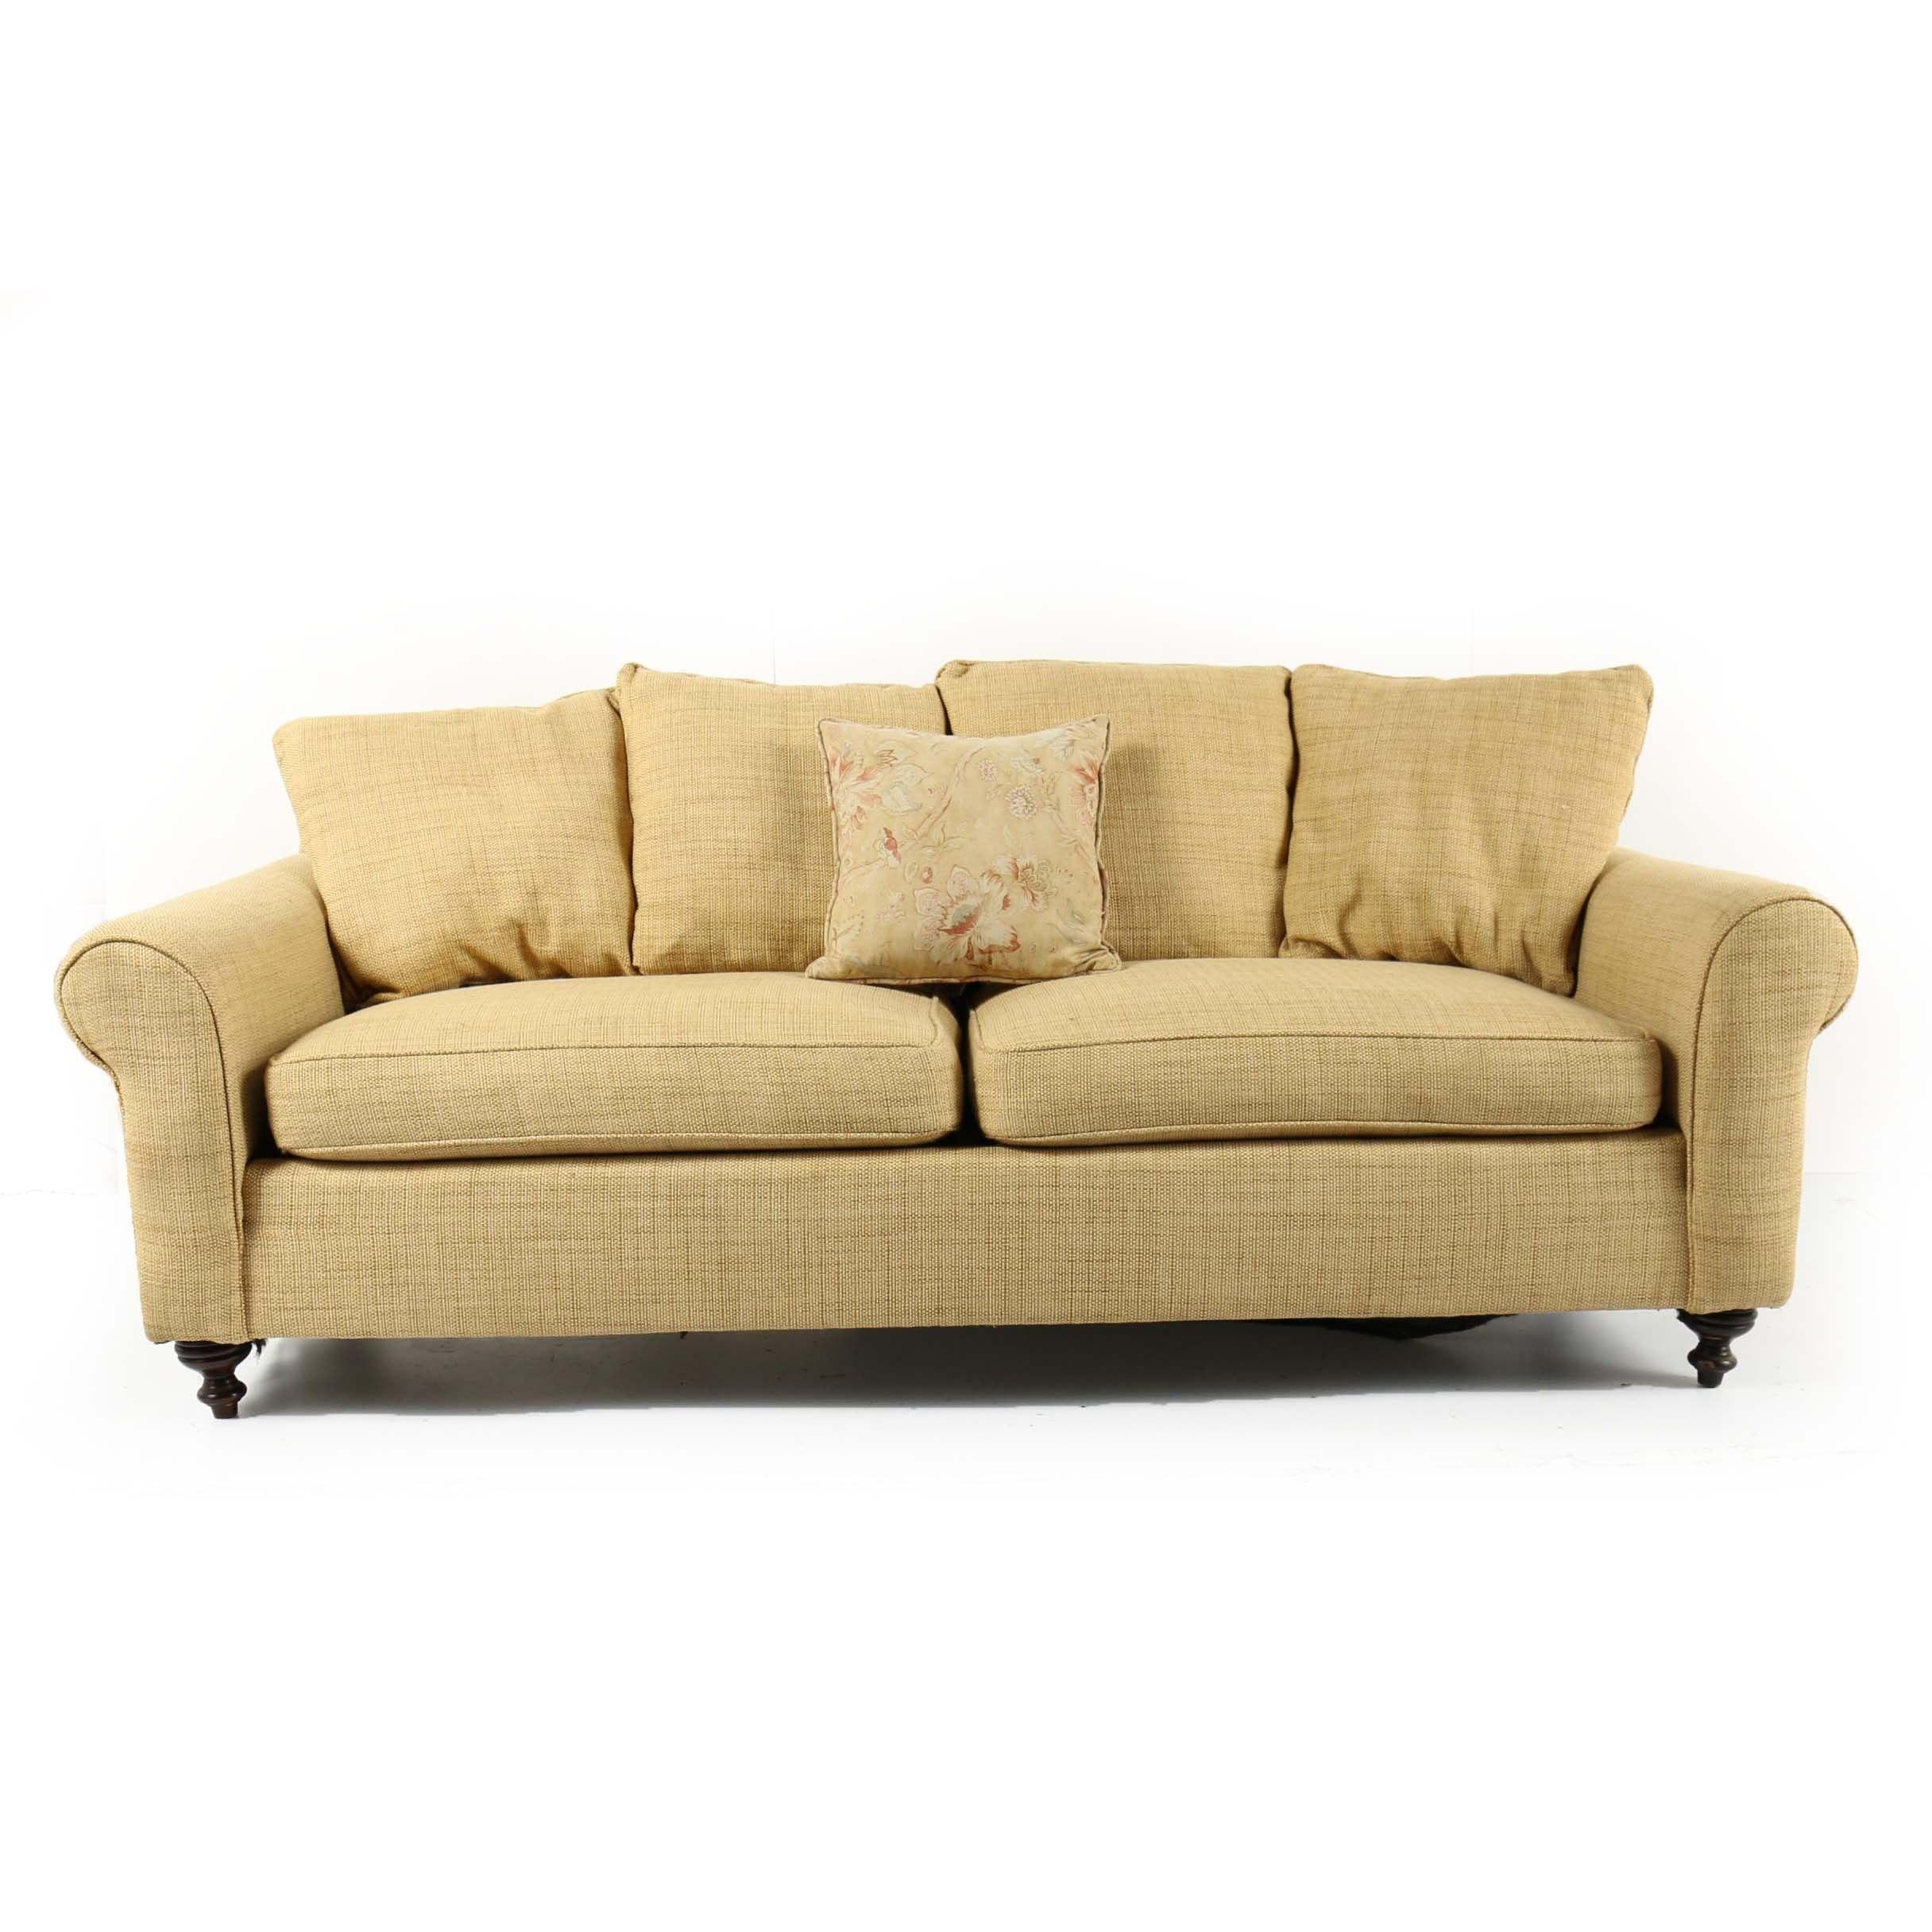 Tan Upholstered Sofa, 21st Century